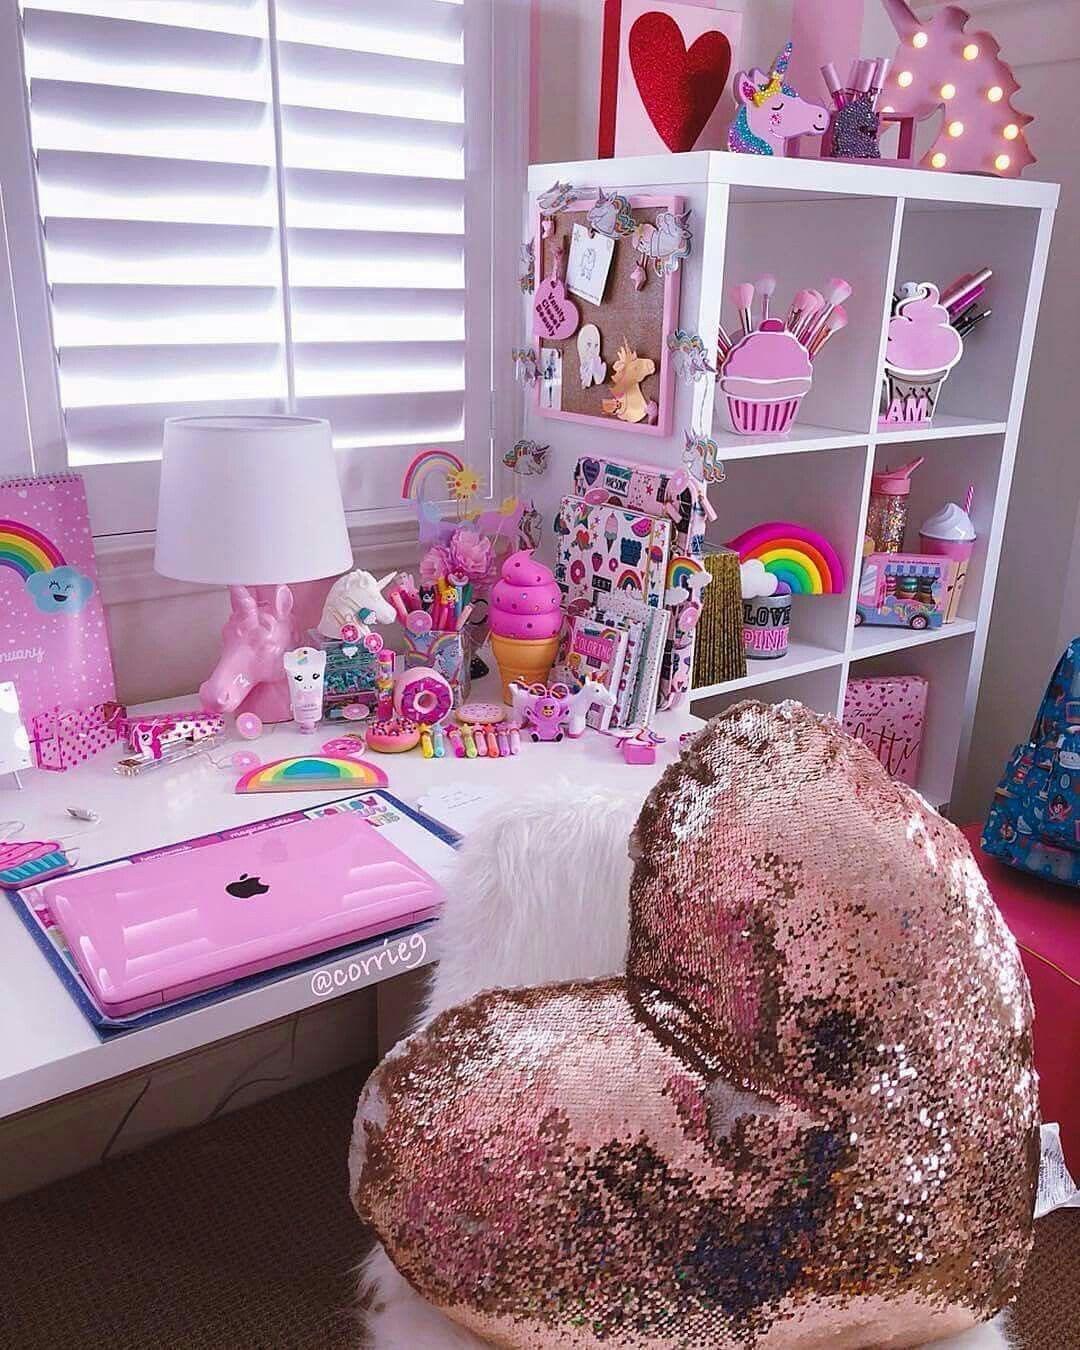 Beautiful Girl Bedroom Ideas 9 Year Old Girl Bedroom Ideas 10 Year Old Girlsbedroom Want To Try This Idea Shared Girls Bedroom Girl Room Colorful Kids Room